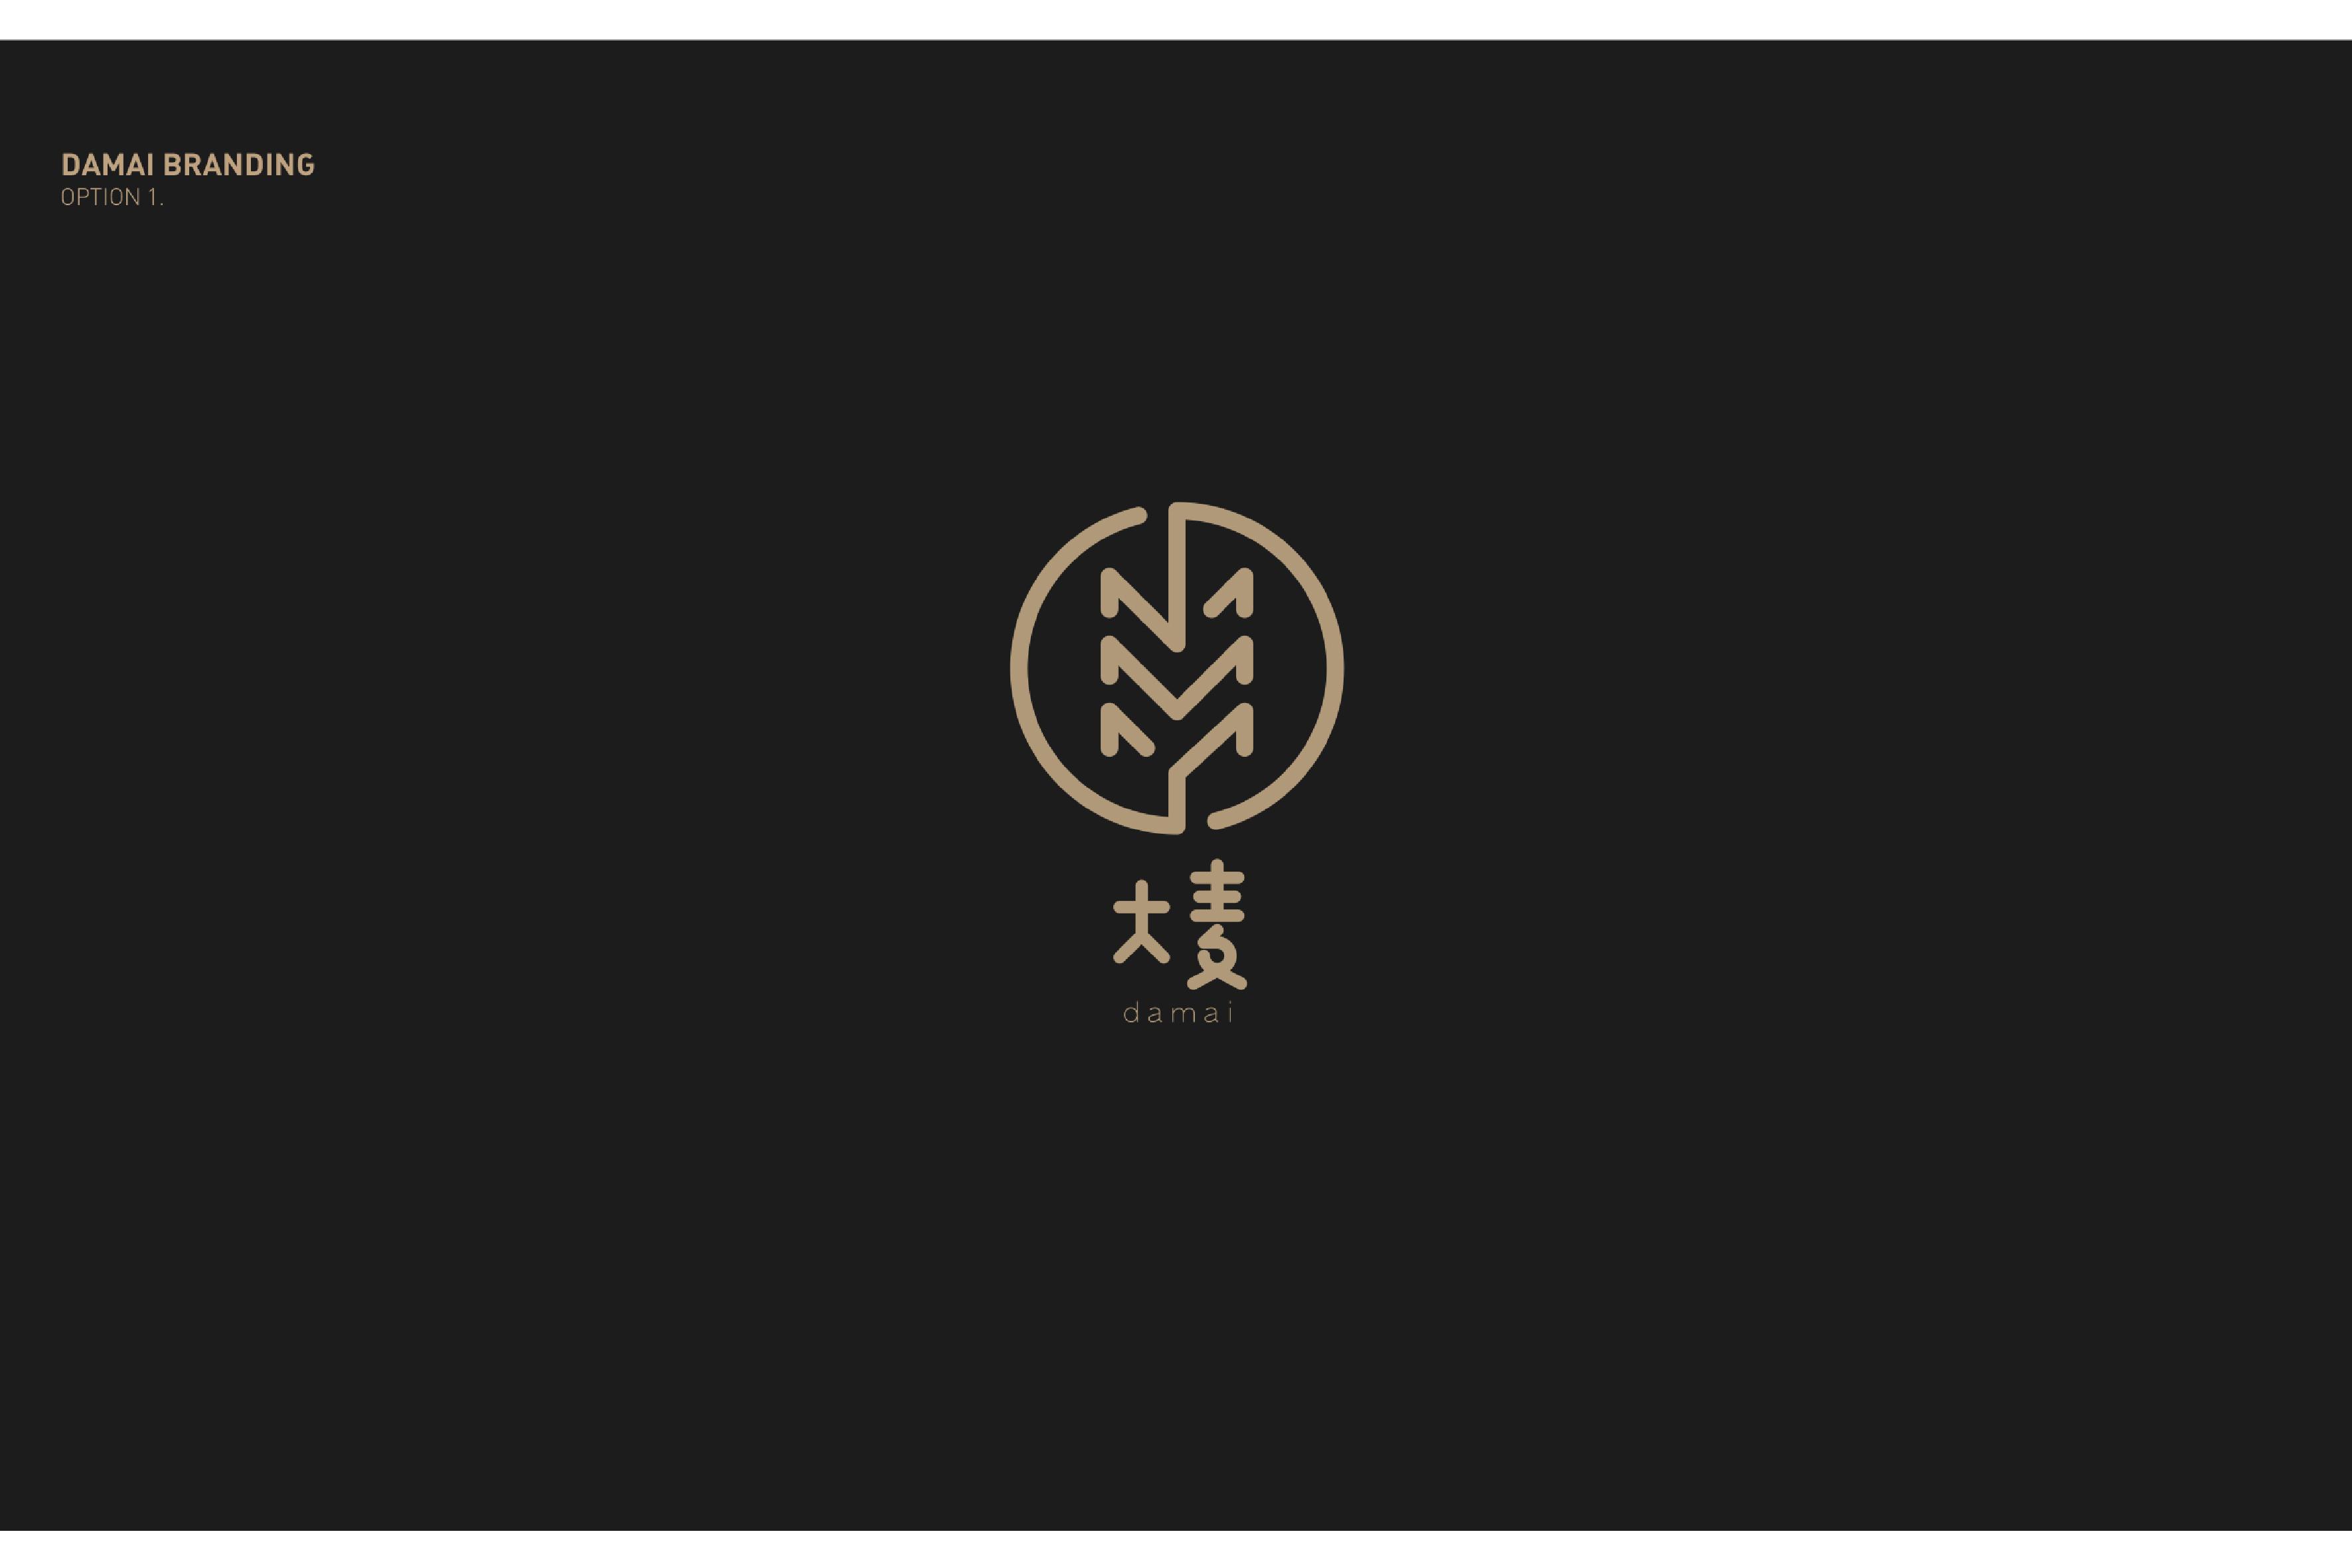 damai_branding-01副本